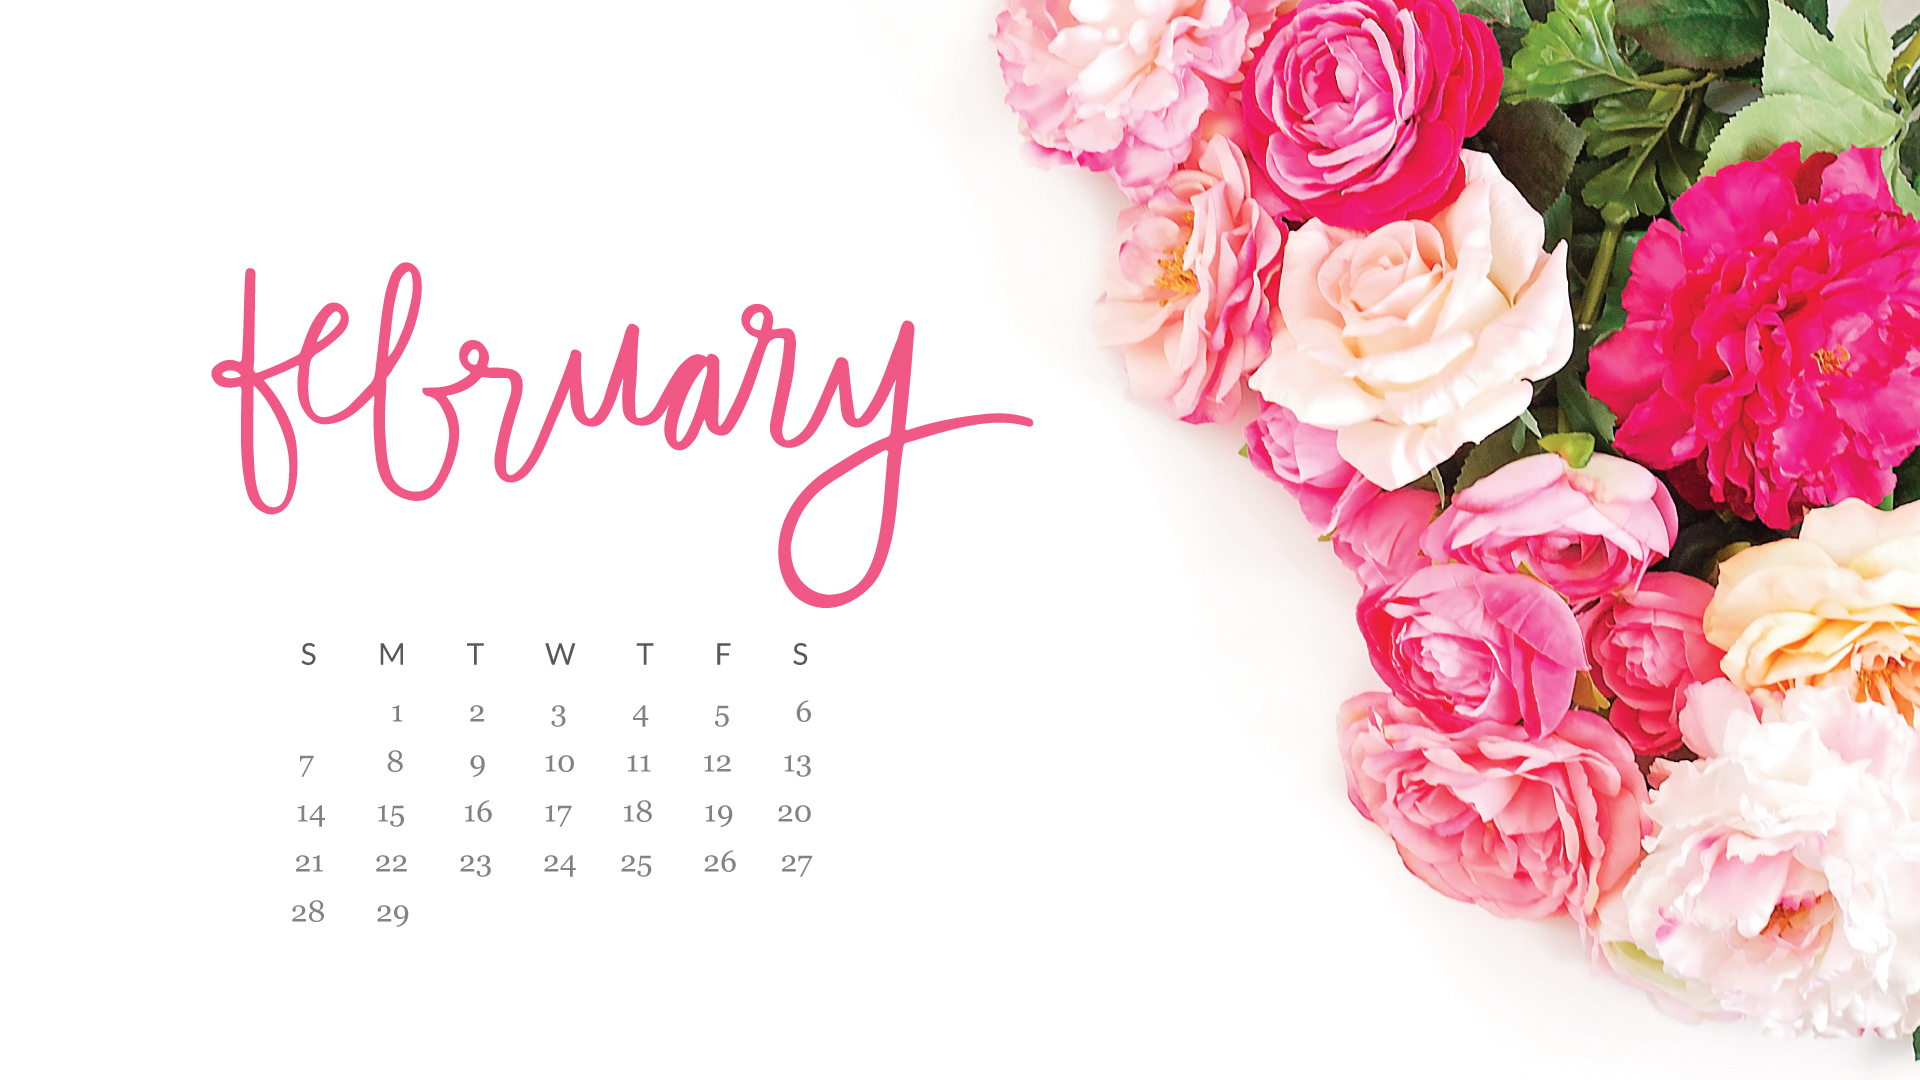 february desktop wallpaper 1920x1080